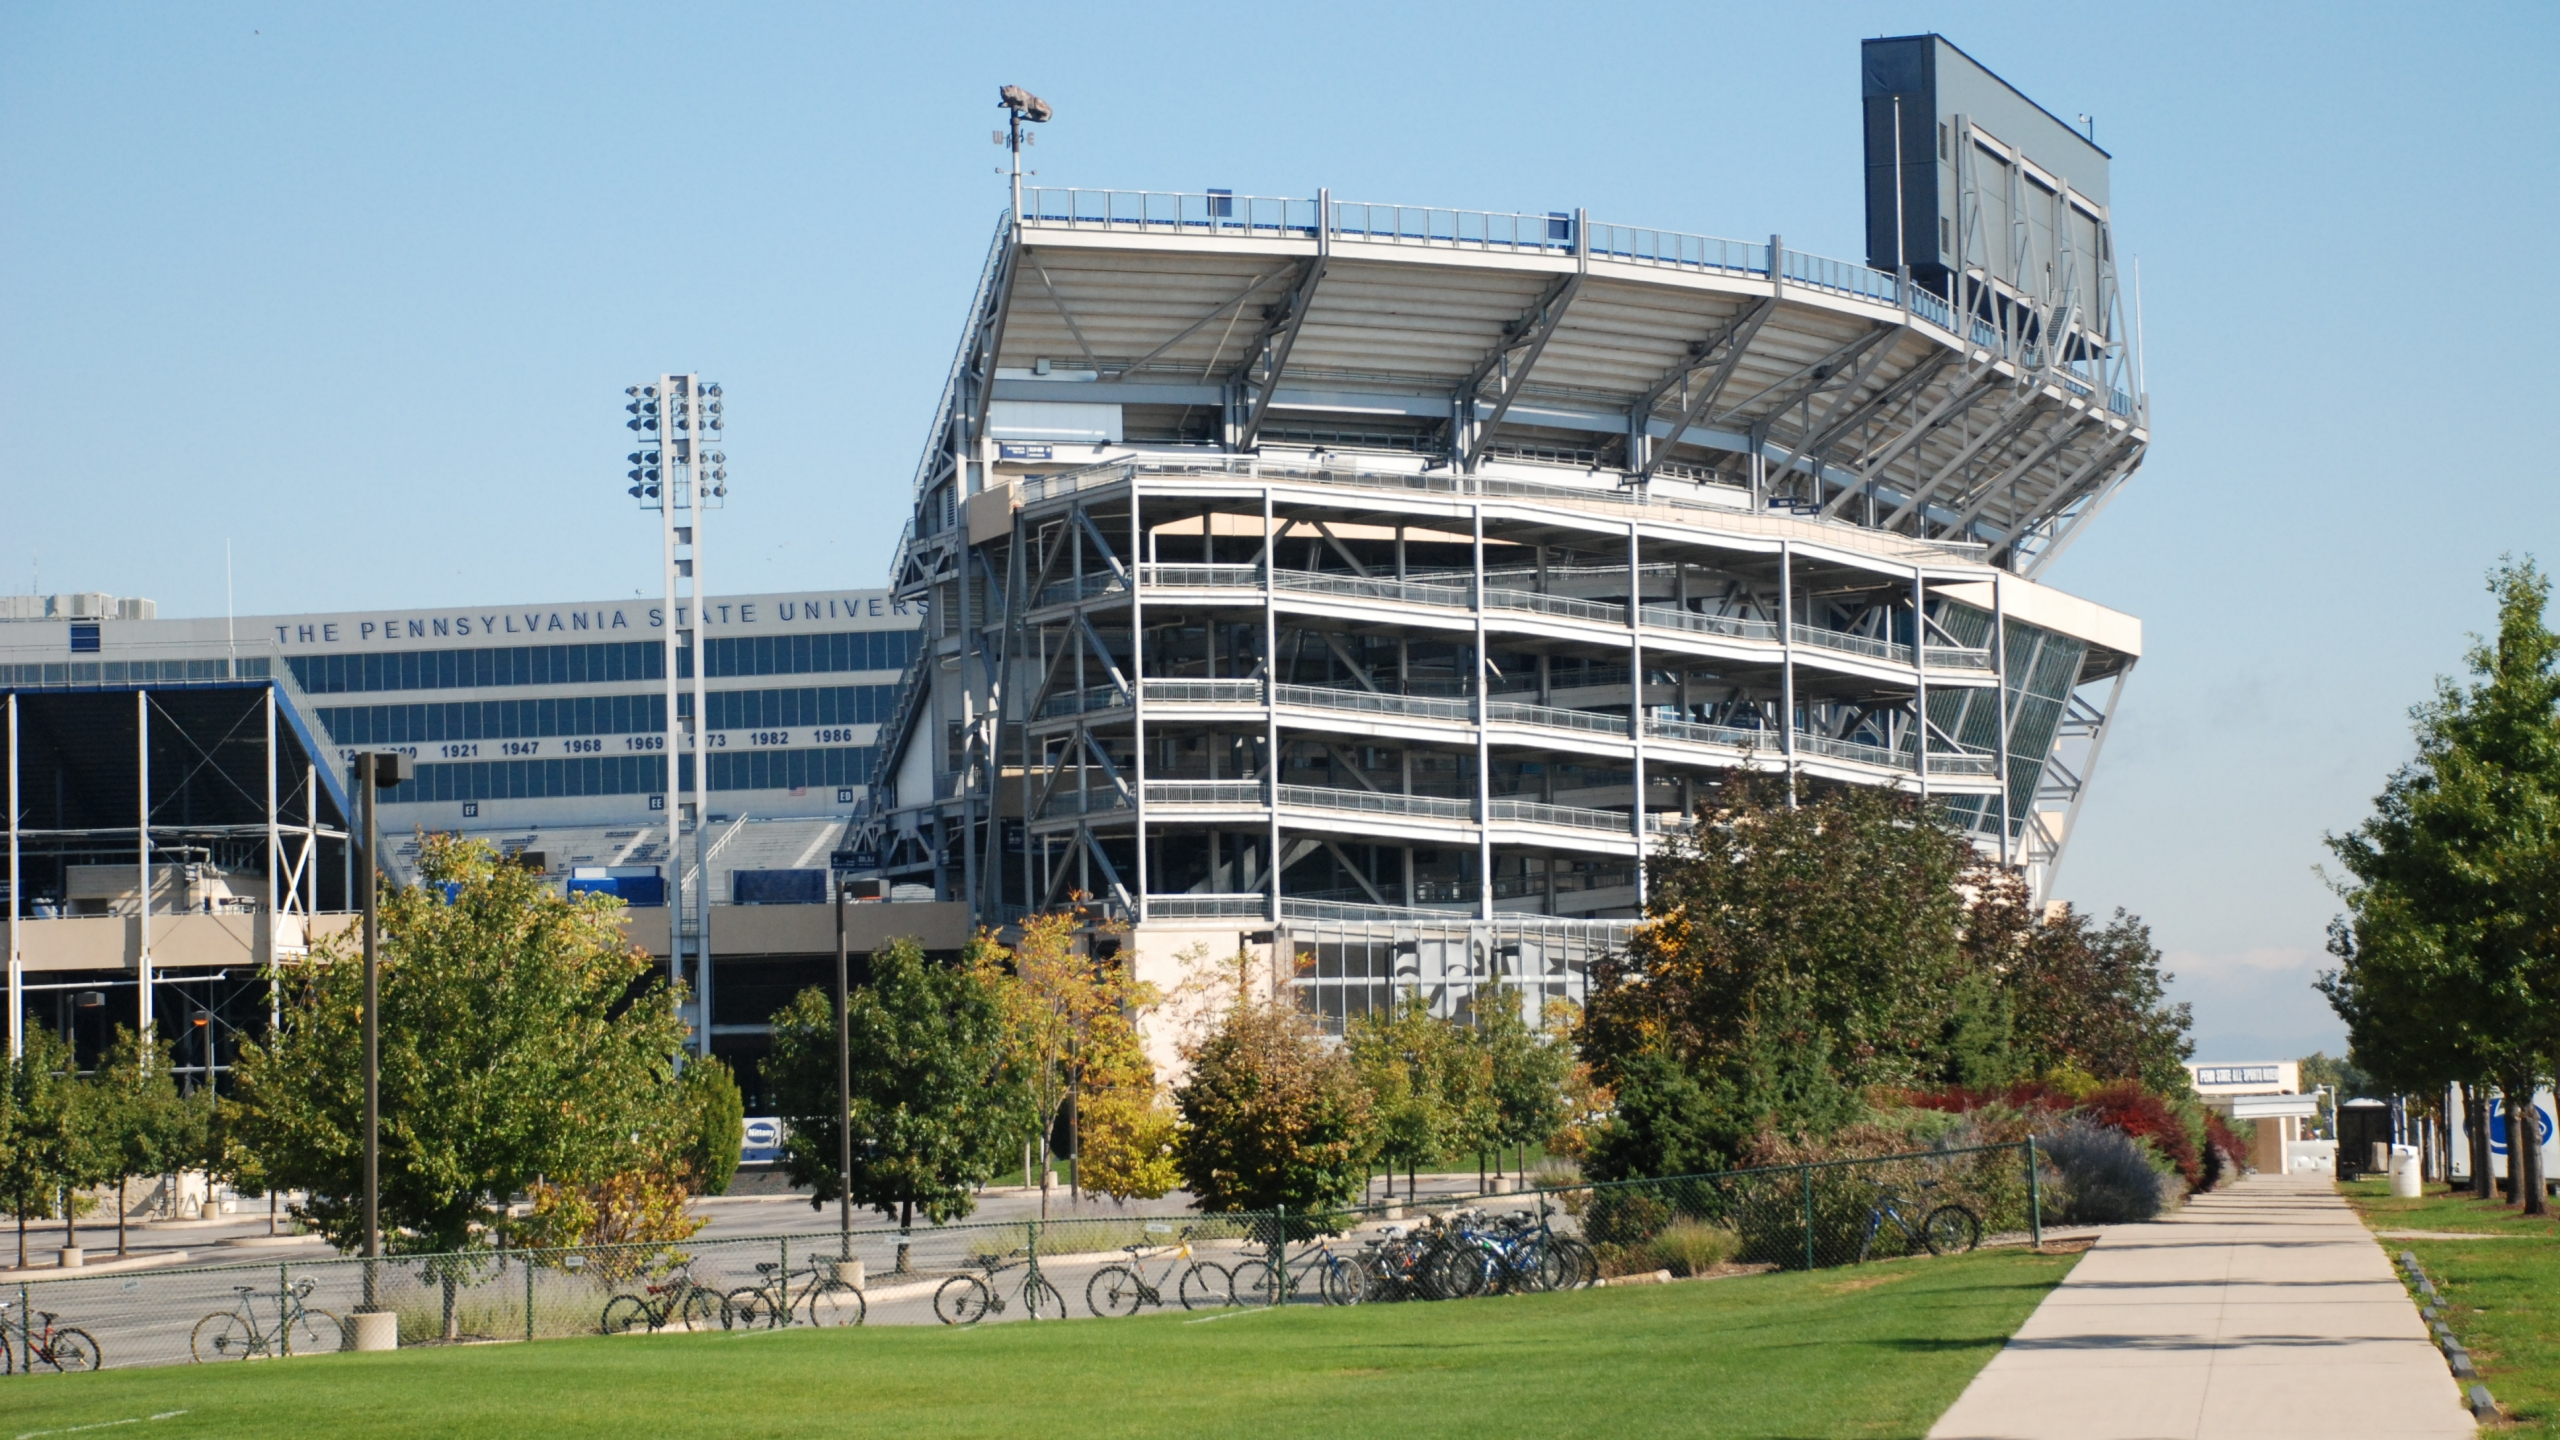 Beaver_Stadium_side_view_1504109503682.JPG